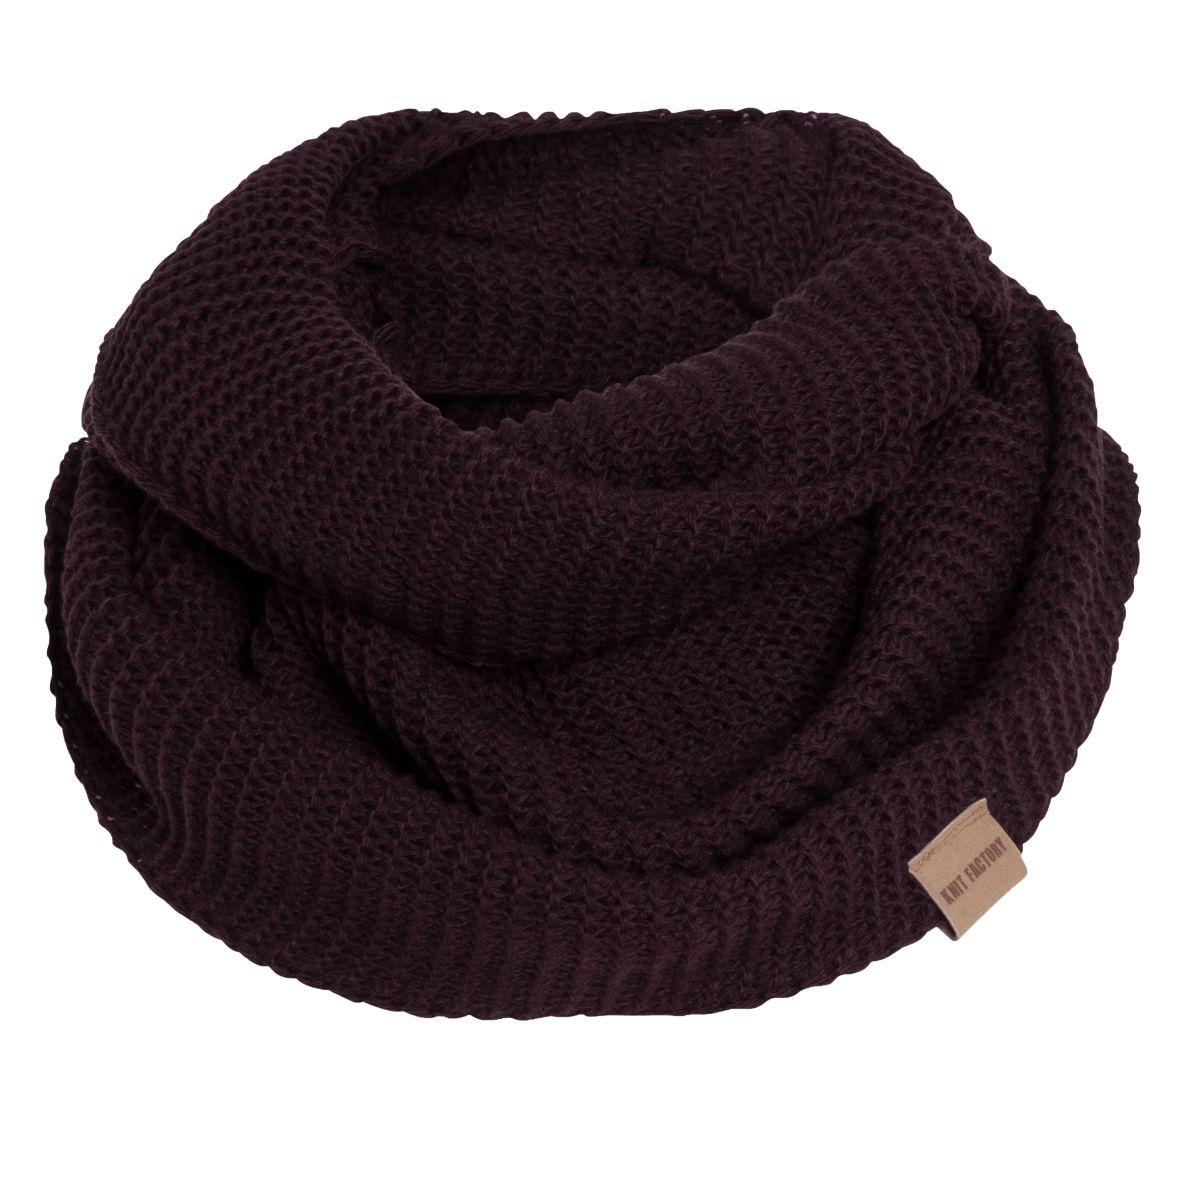 jamie infinity scarf aubergine